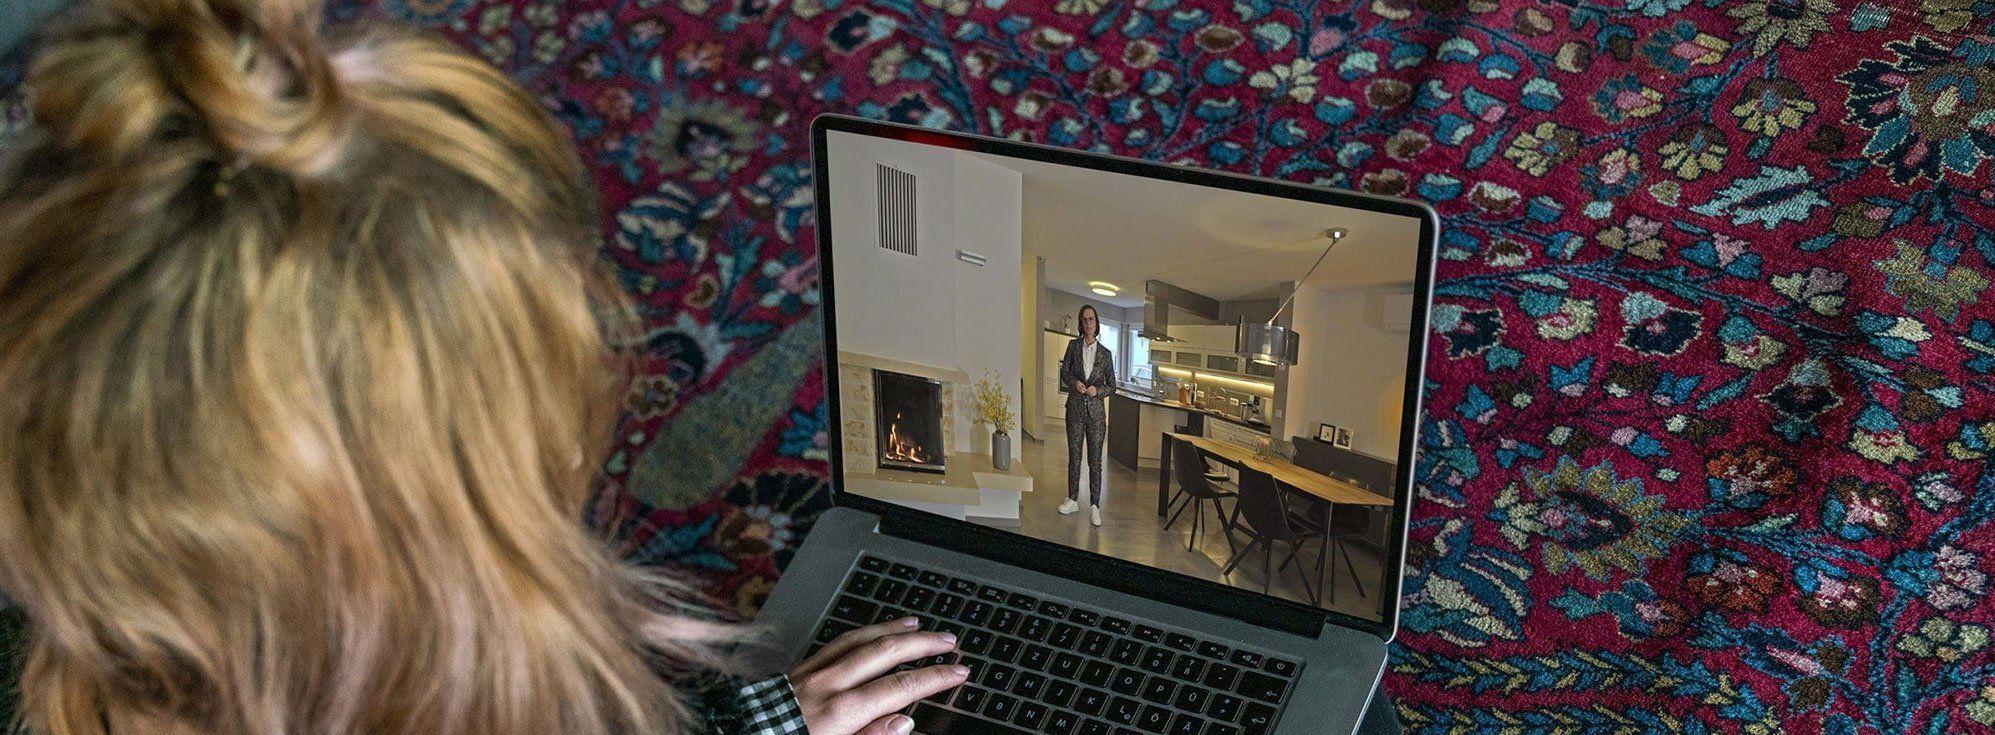 Frau auf Immobiliesuche in Ratingen